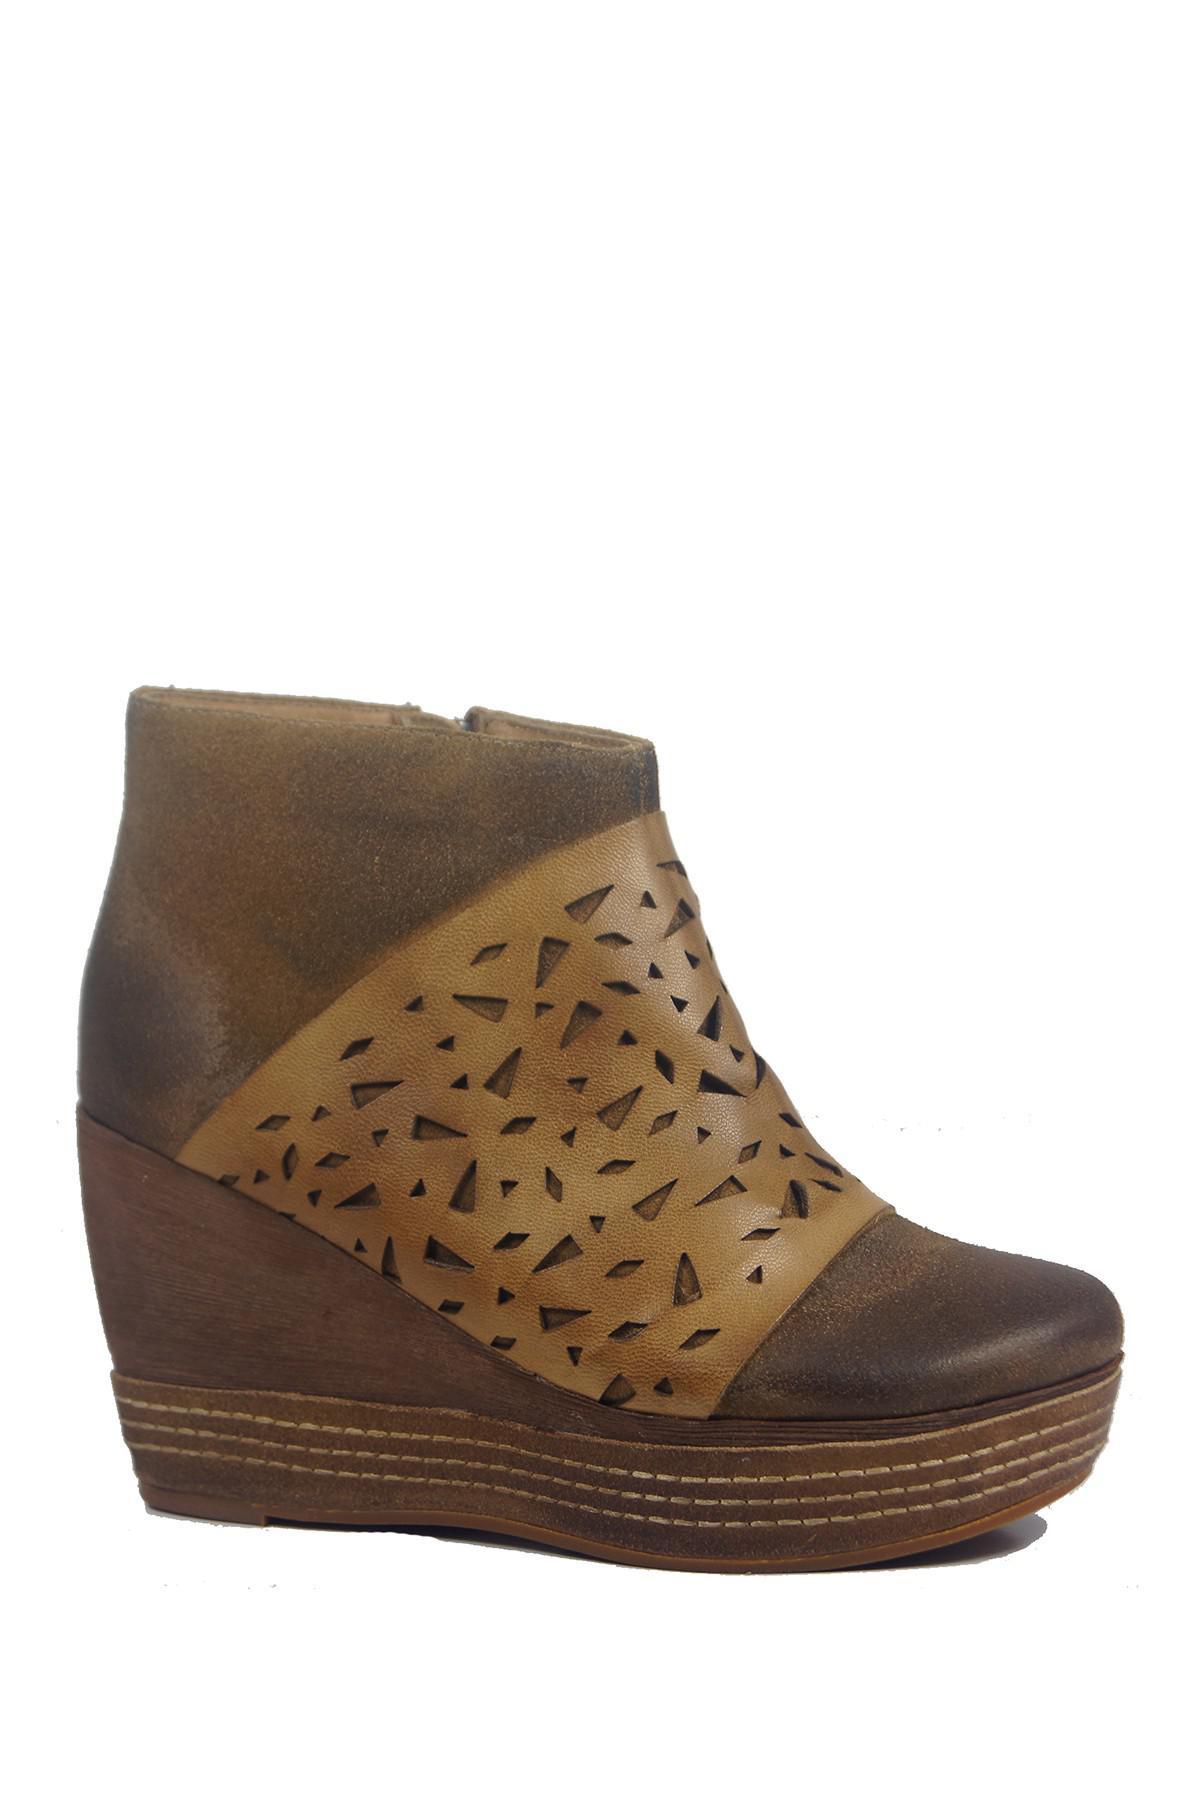 9e651a05ca20 Lyst - Antelope Lasercut Wedge Heel Bootie in Brown